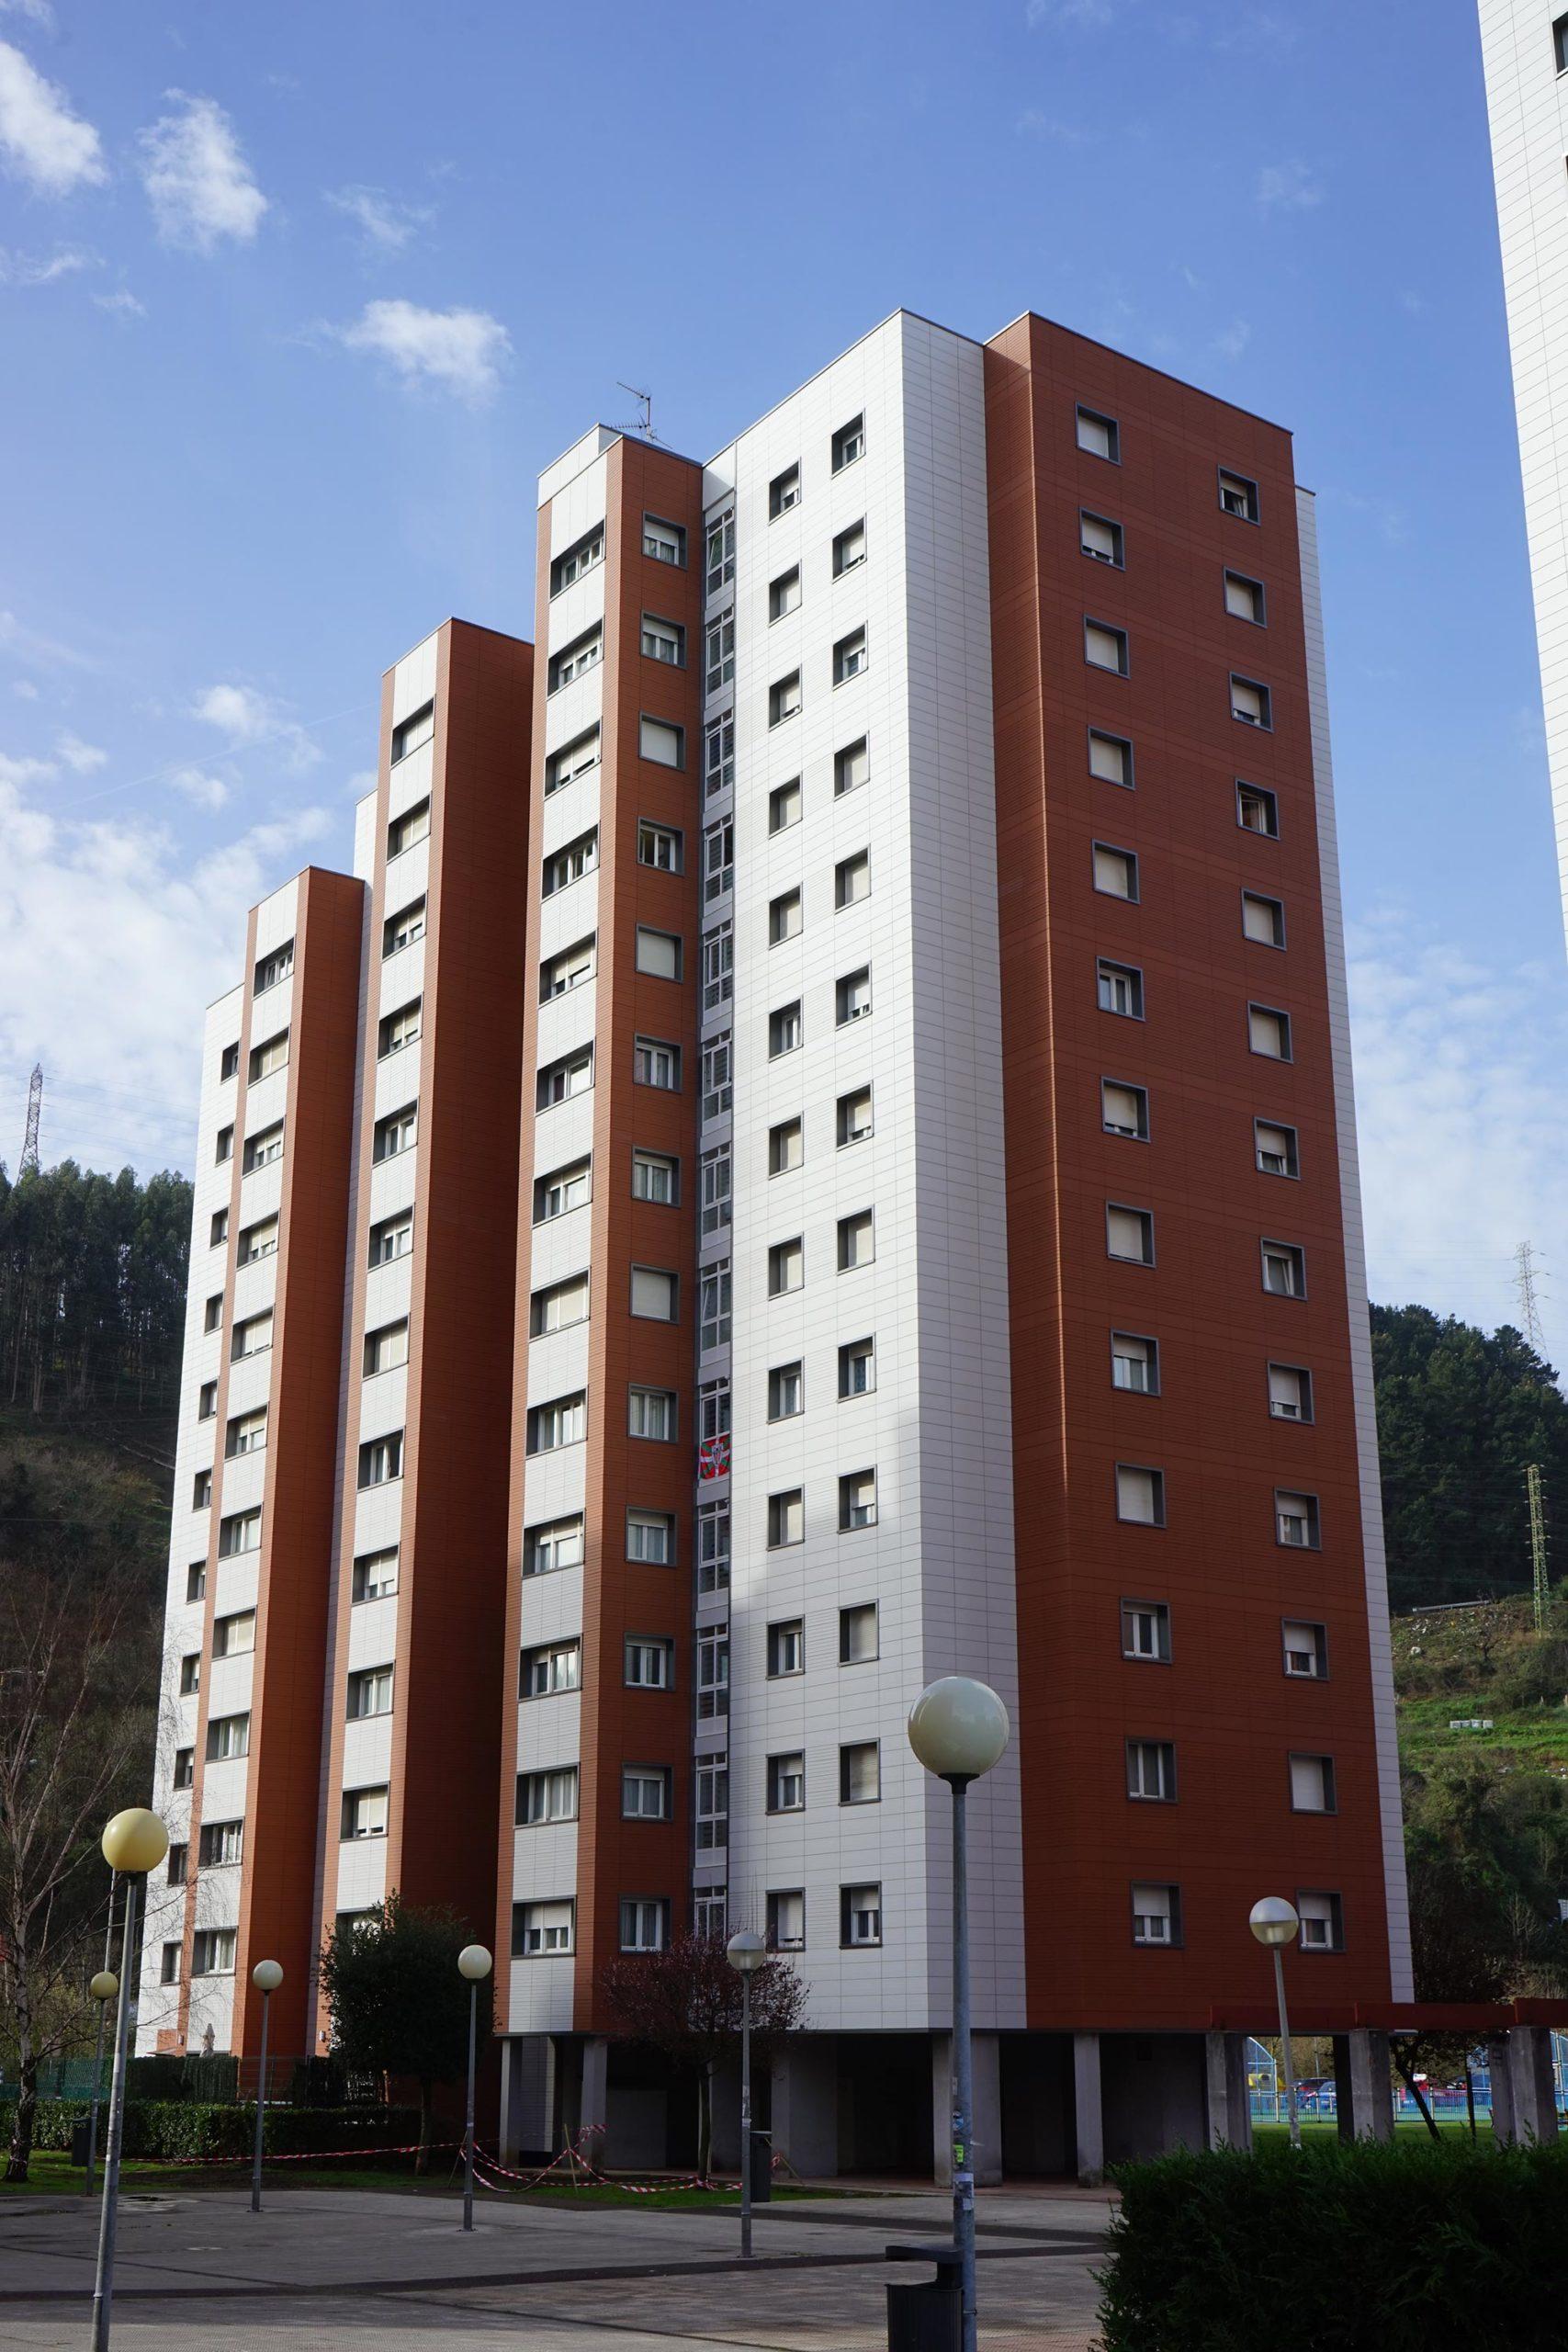 Andrasa_Grupo Loizaga_vertical